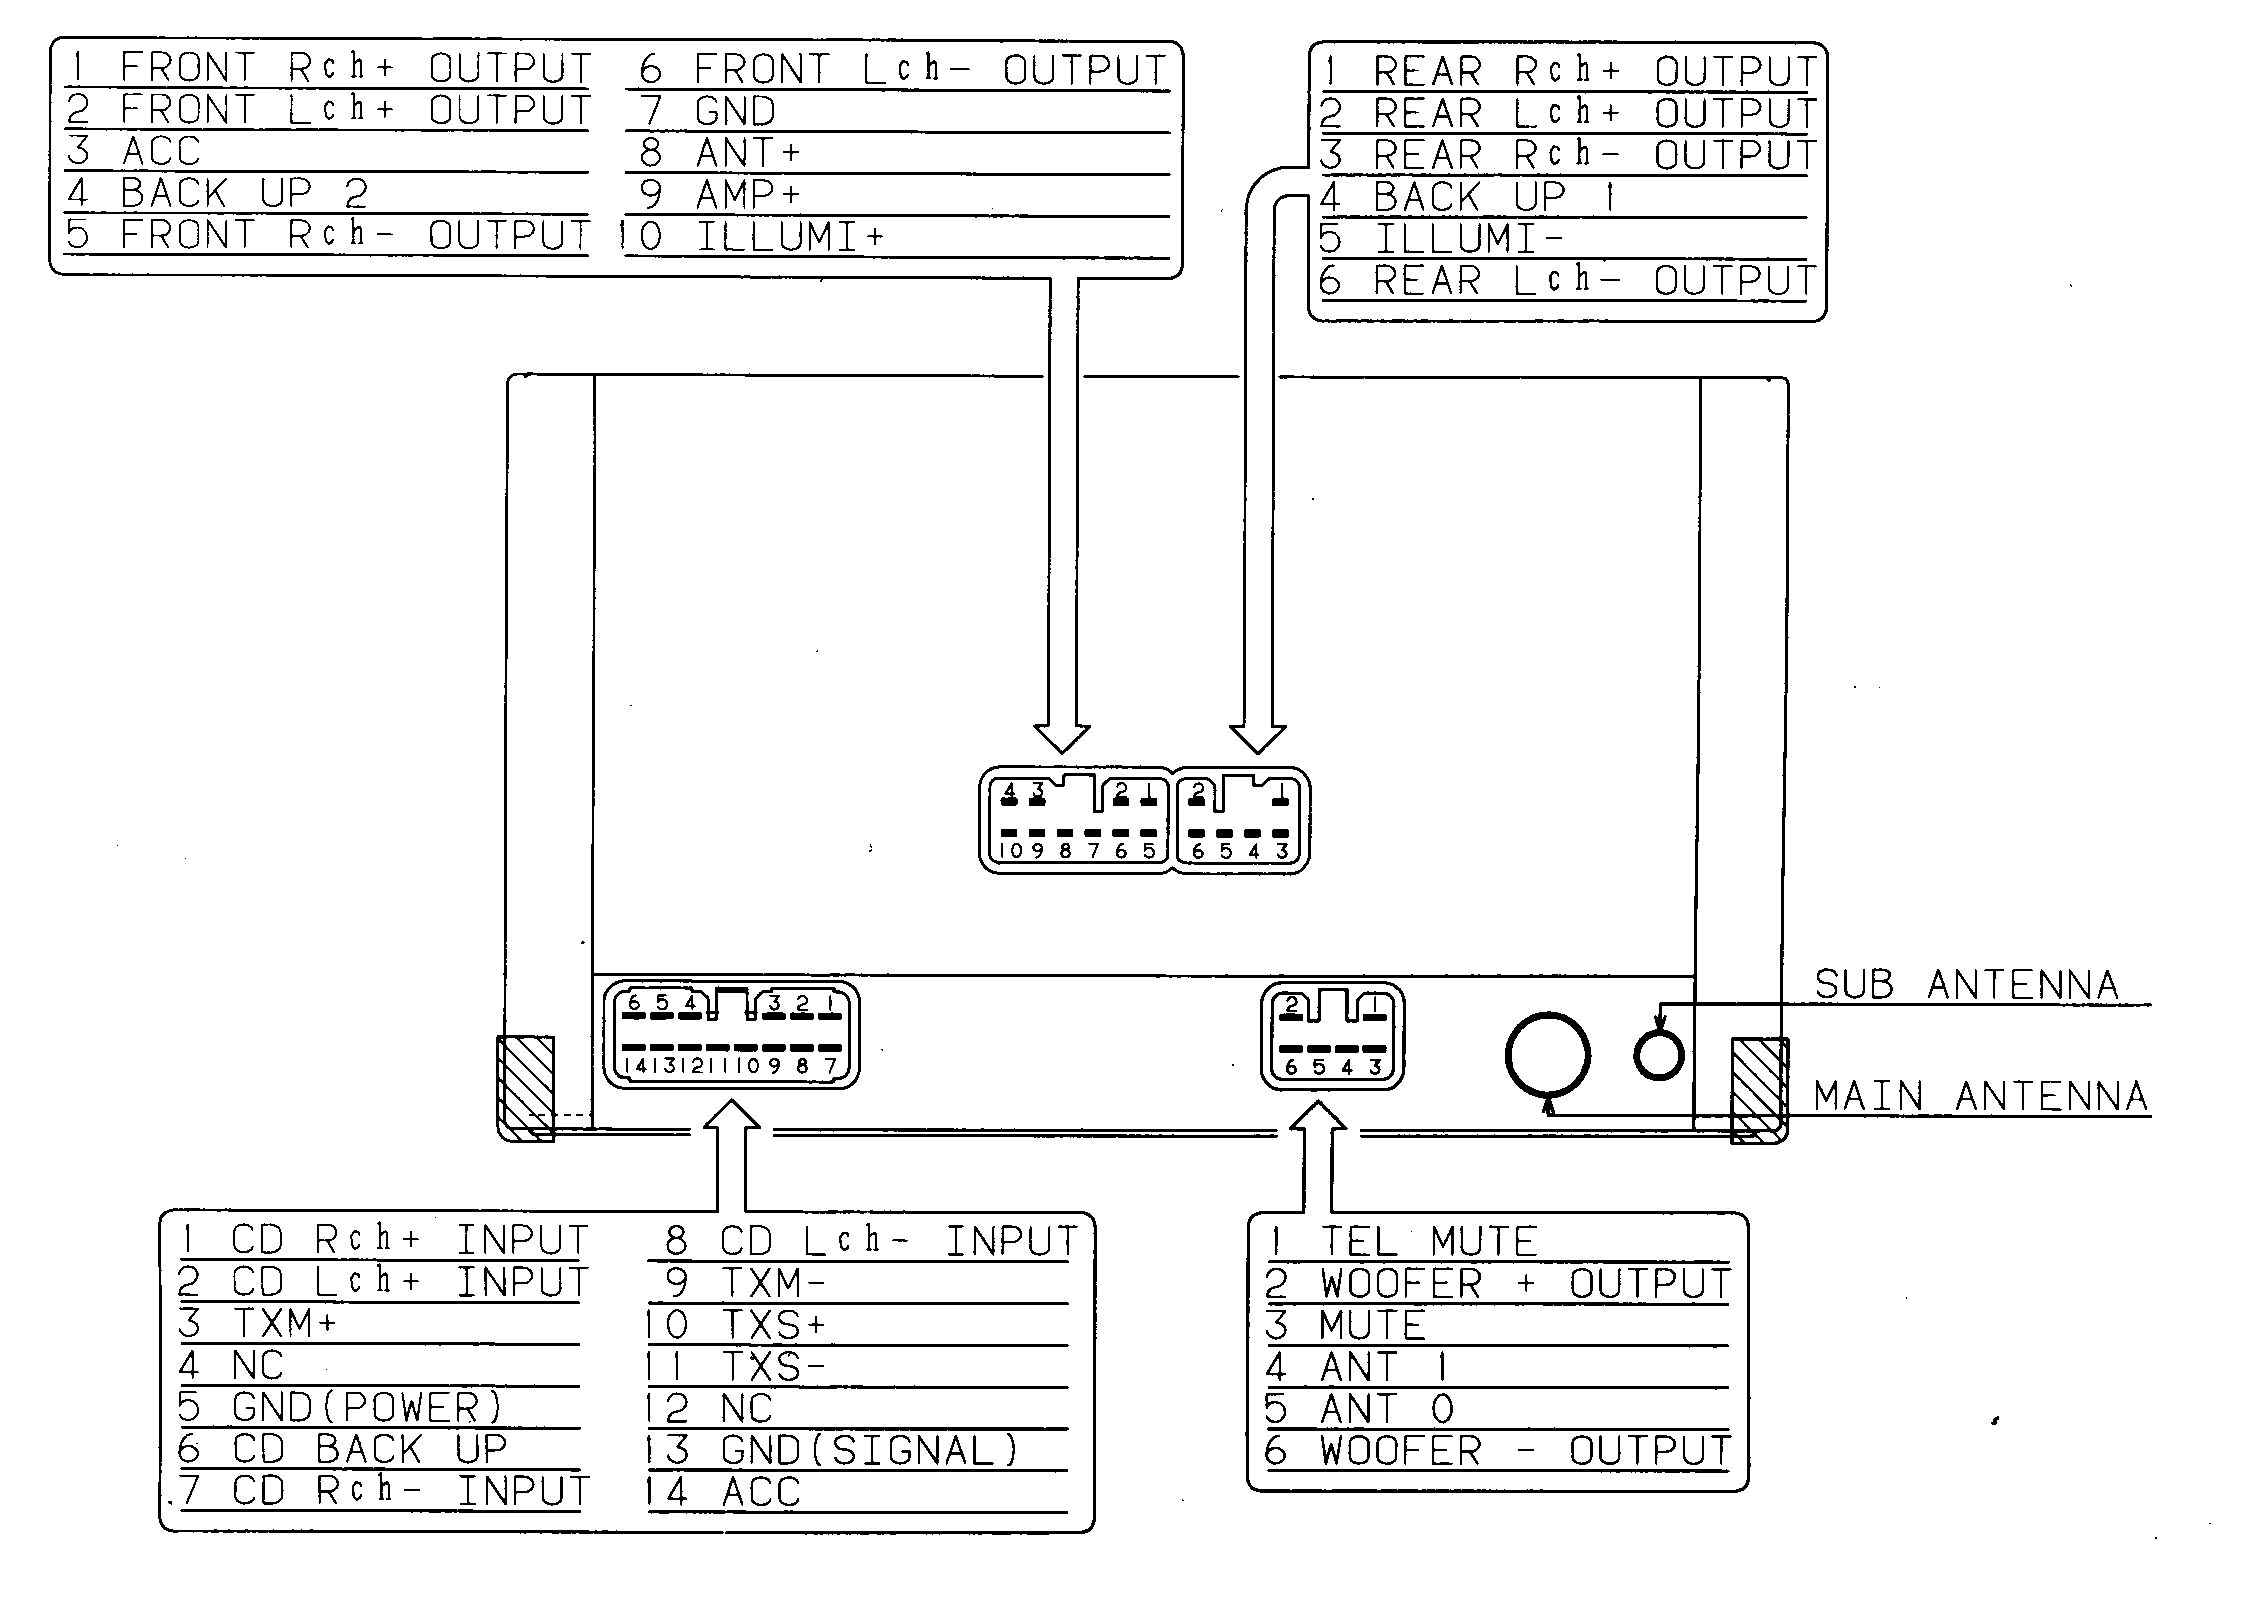 wiring diagram for lexus is200 stereo wiring library Sub Wiring-Diagram tahoe radio wiring harness auto electrical wiring diagram 91 ls400 wiring diagram lexus alarm wiring